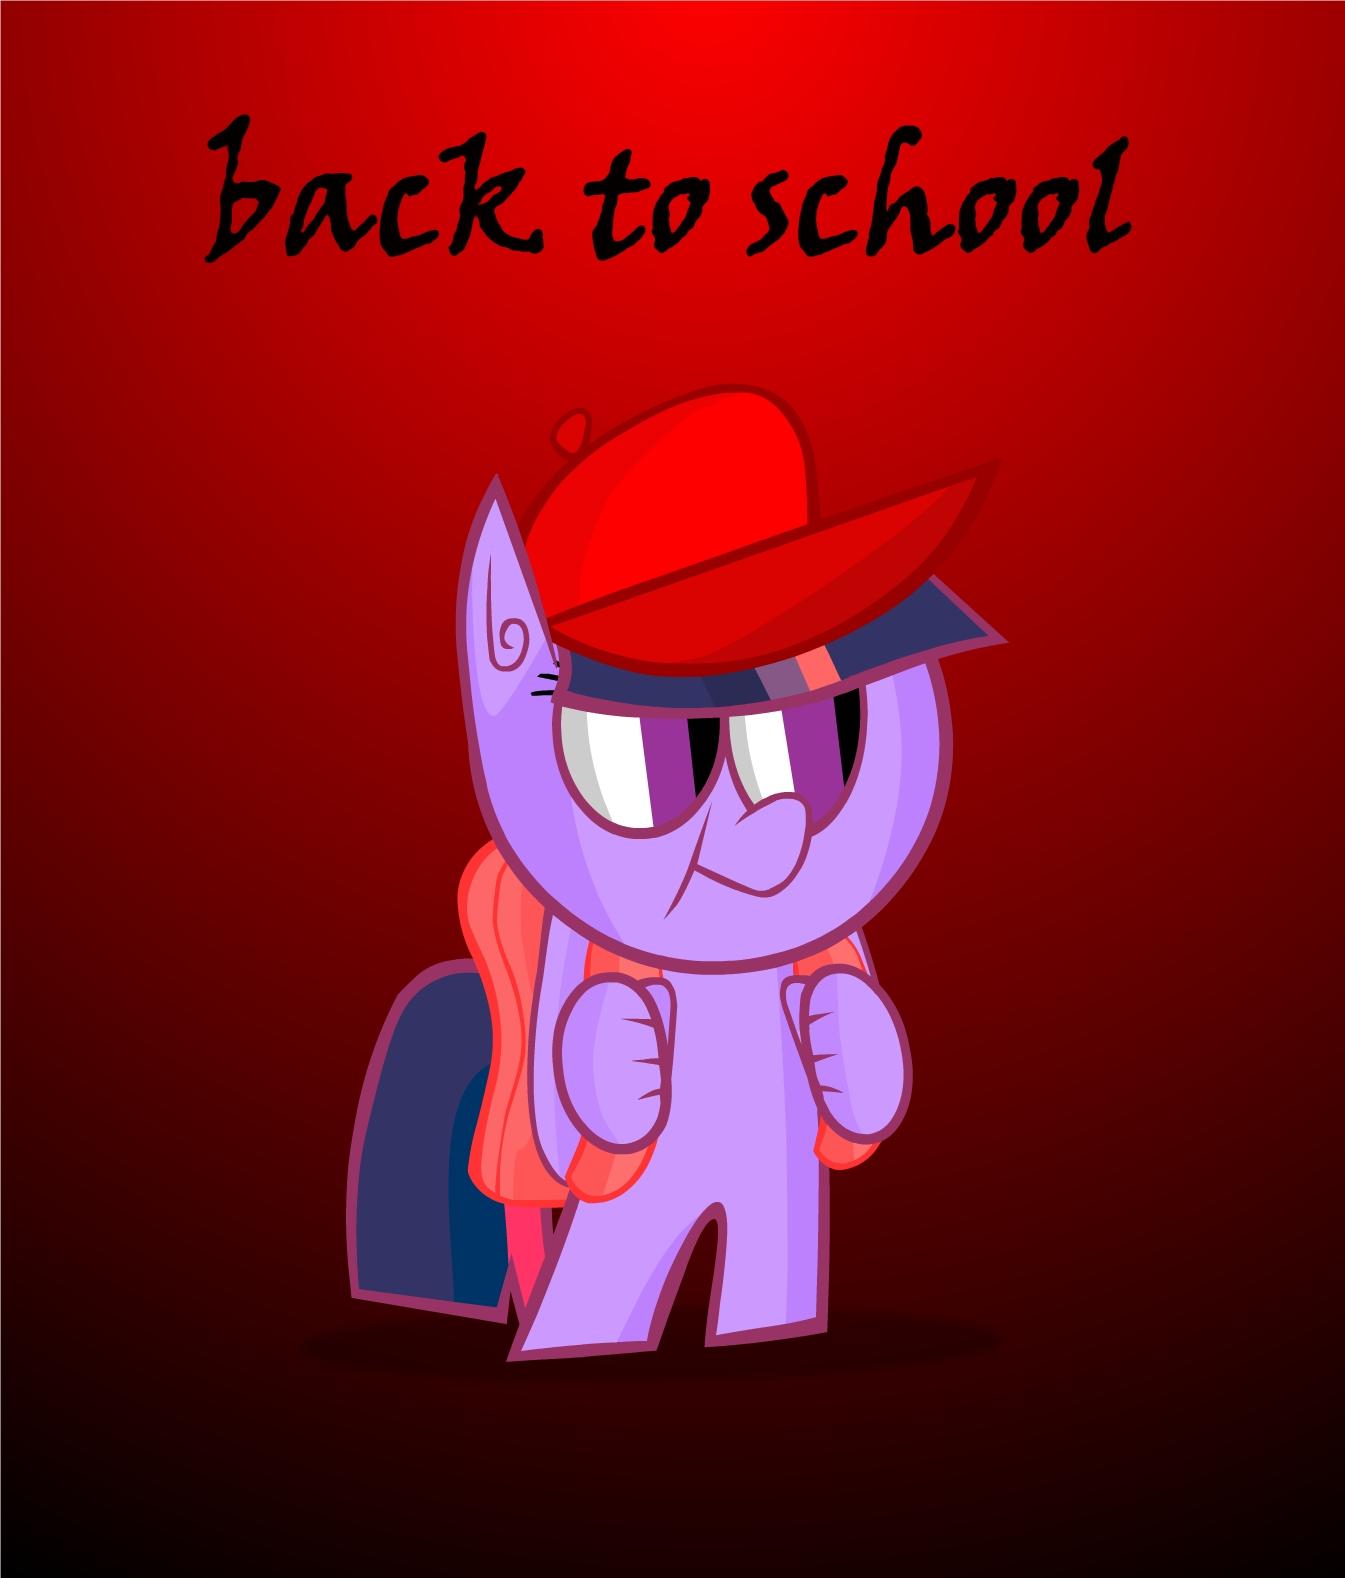 Going back to school twilight?